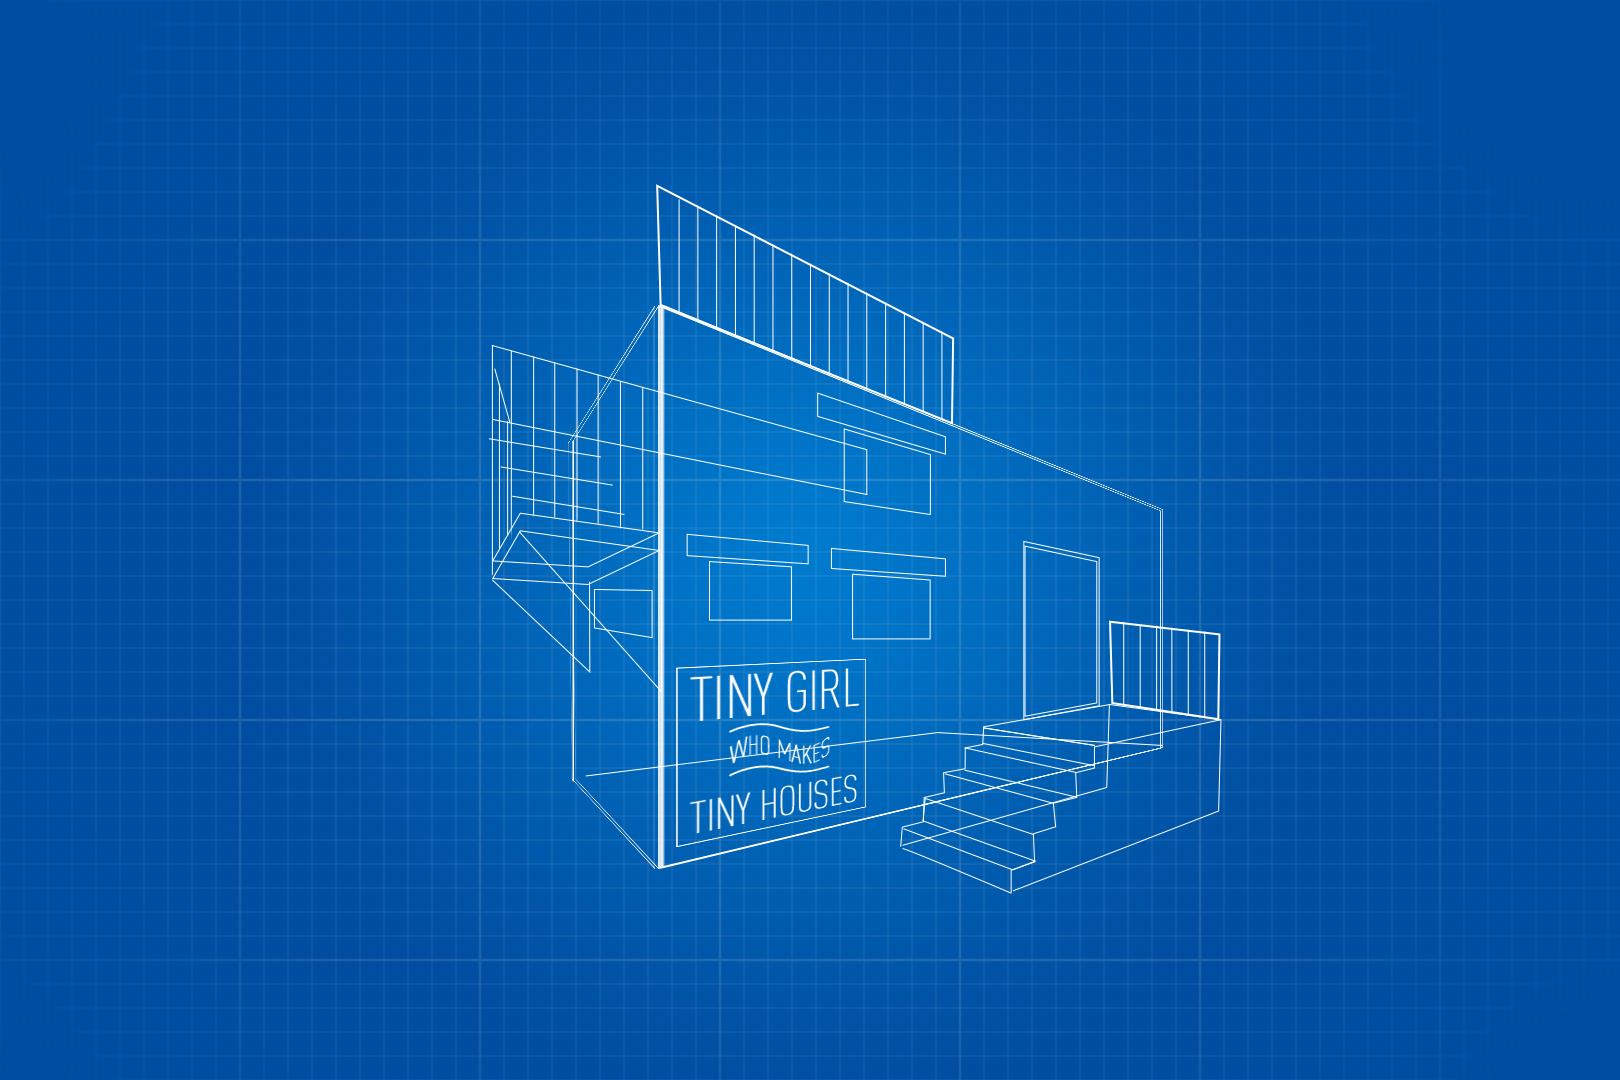 TinyGirl